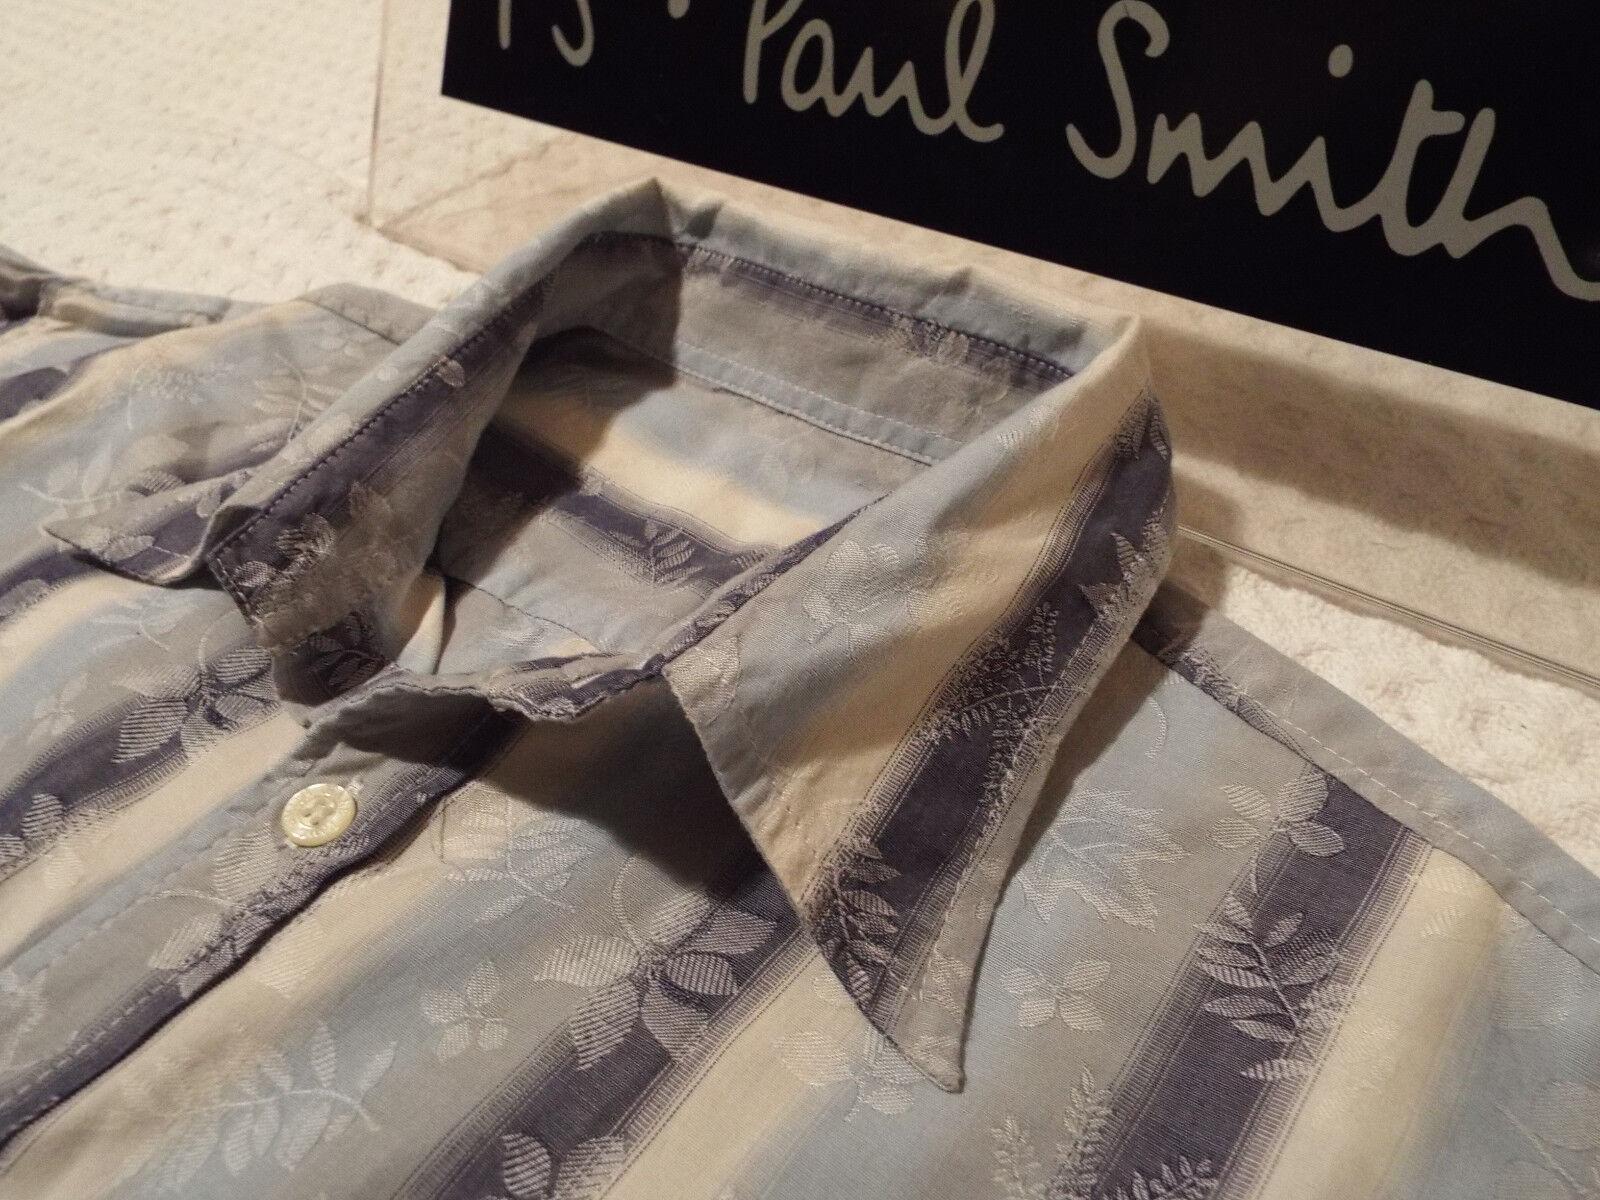 PAUL SMITH Mens Shirt  Size M (CHEST 42 )  RRP +  FLORAL JACQUARD